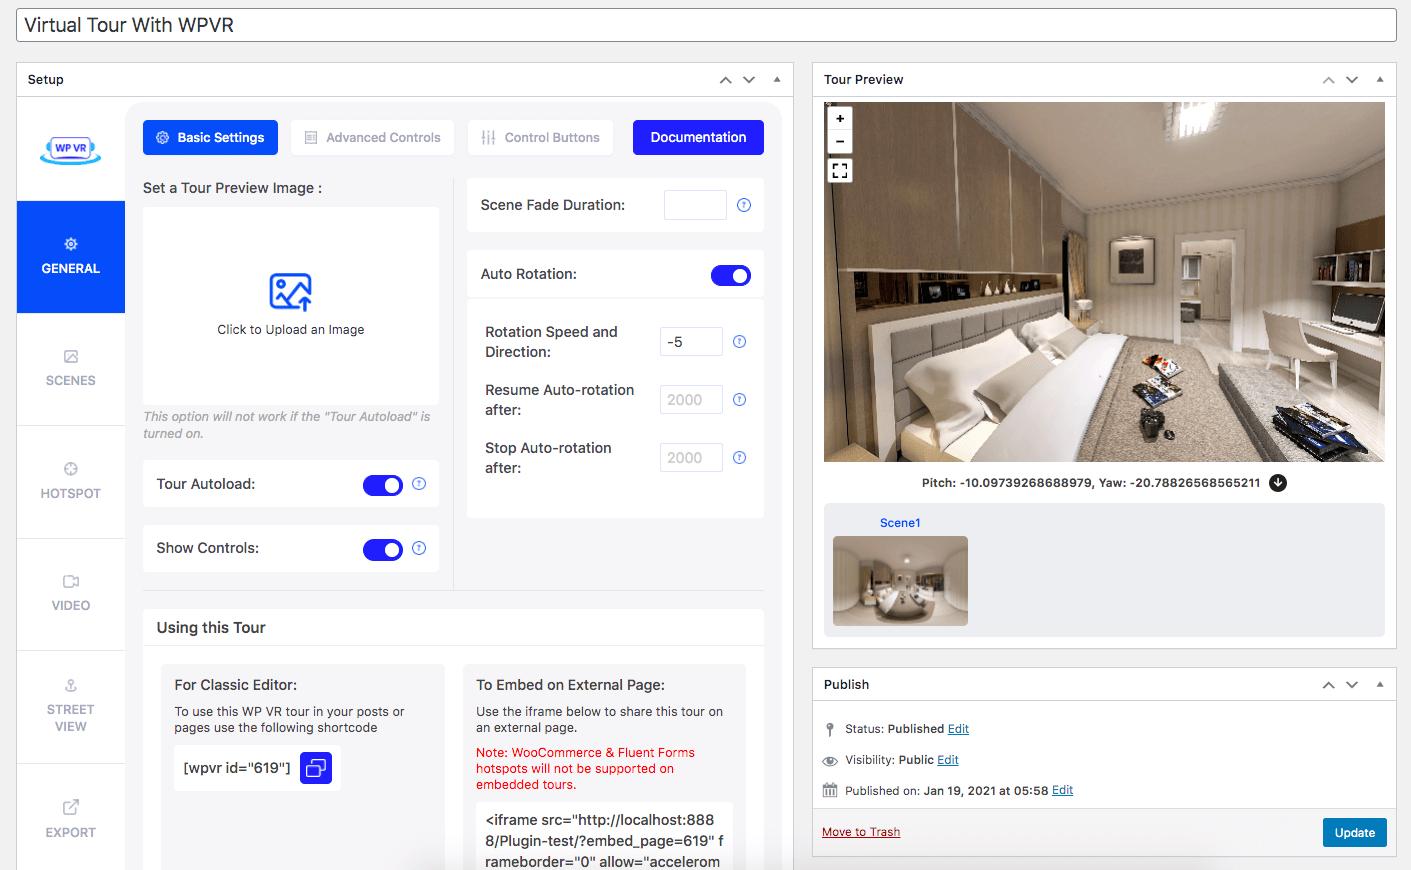 WP VR Basic Settings